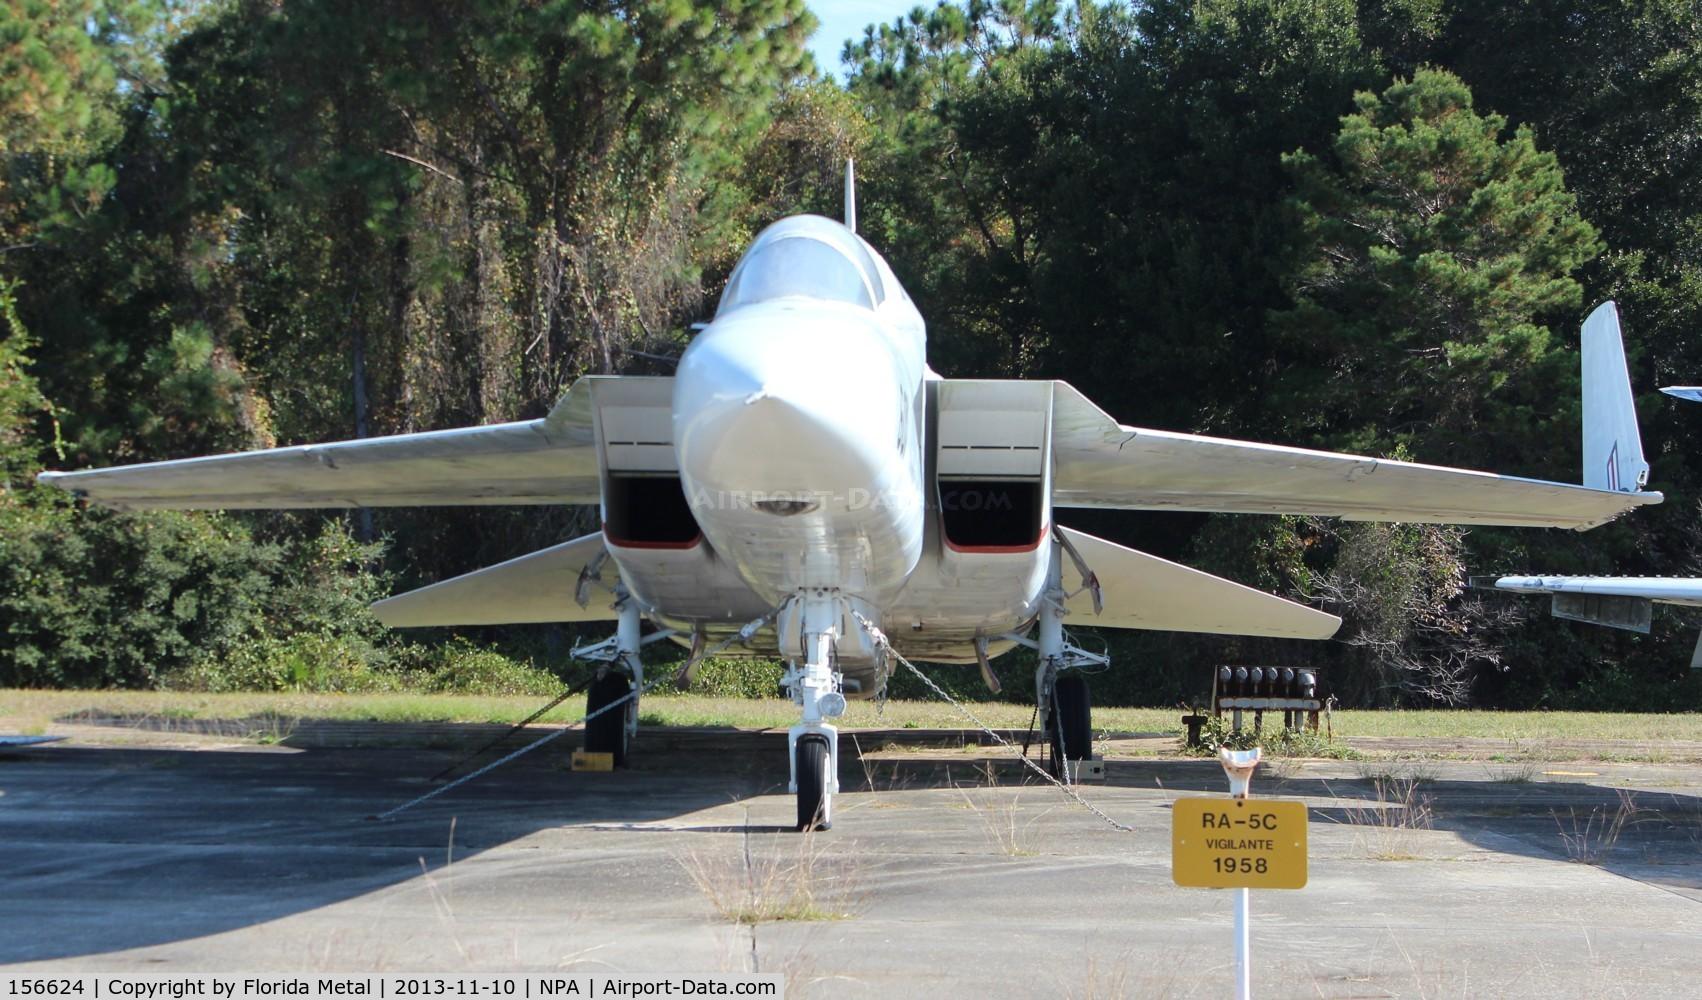 156624, 1969 North American RA-5C Vigilante C/N NR316-17, RA-5C